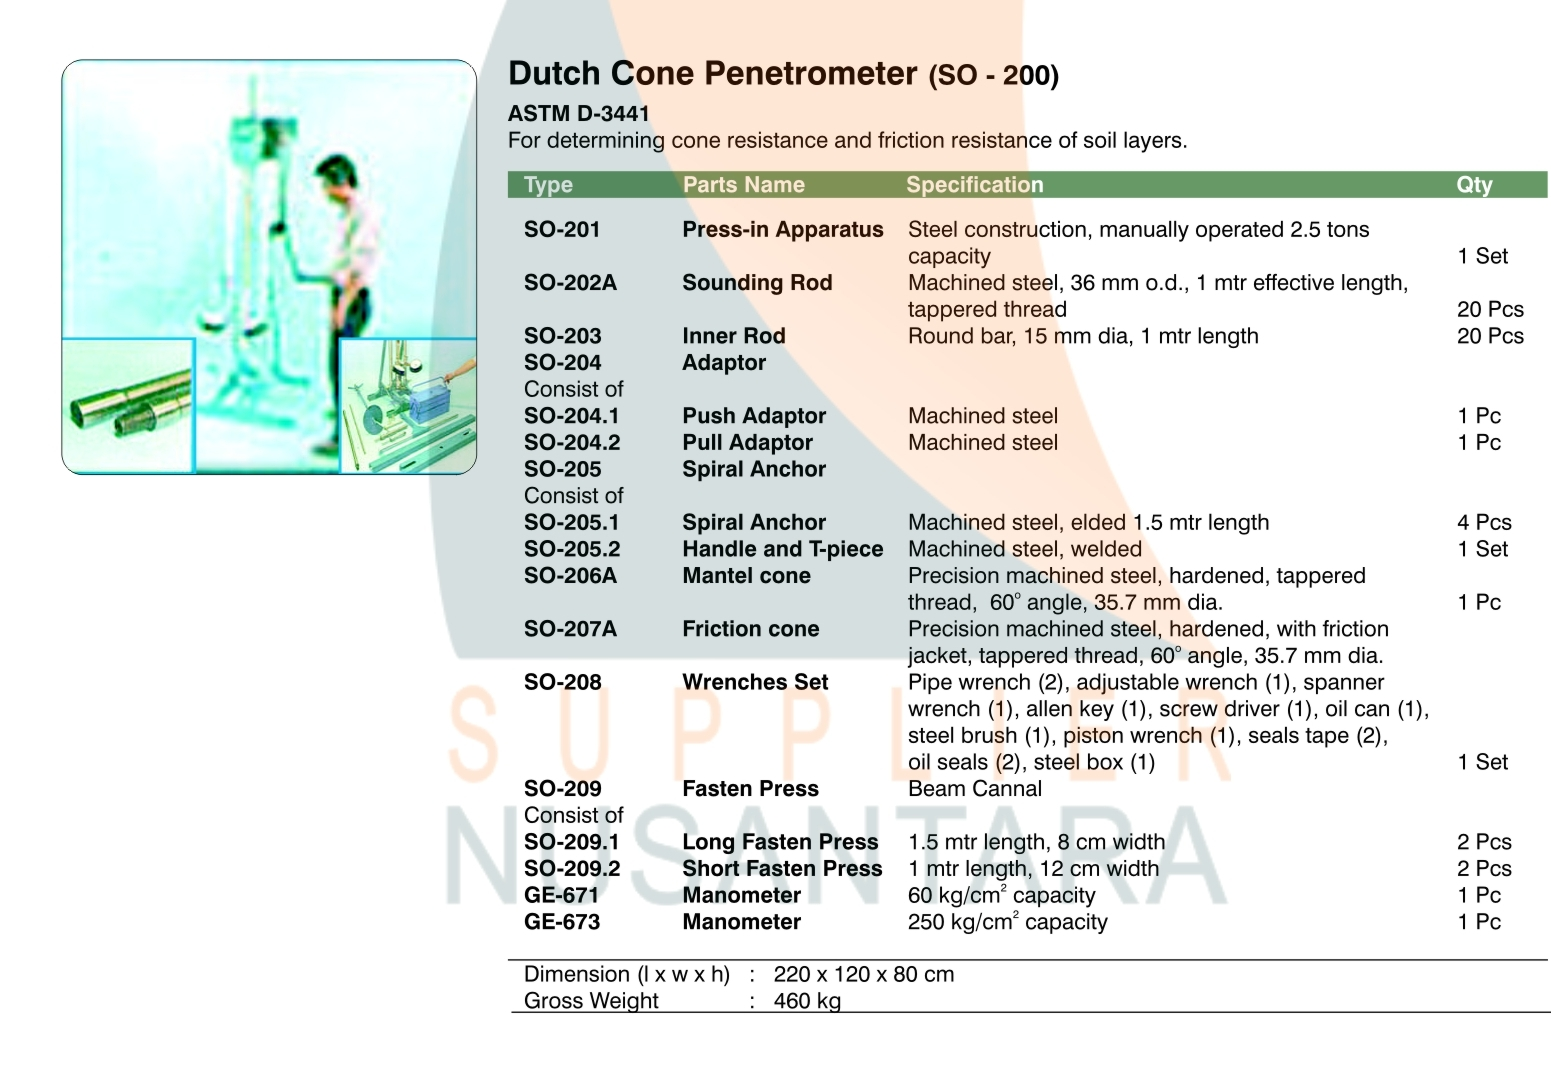 Dutch Cone Penetrometer Sondir 25 Ton So 200 Supplier Nusantara Integrated Testing And Measuring Unit Constant Isc2000 Product Description